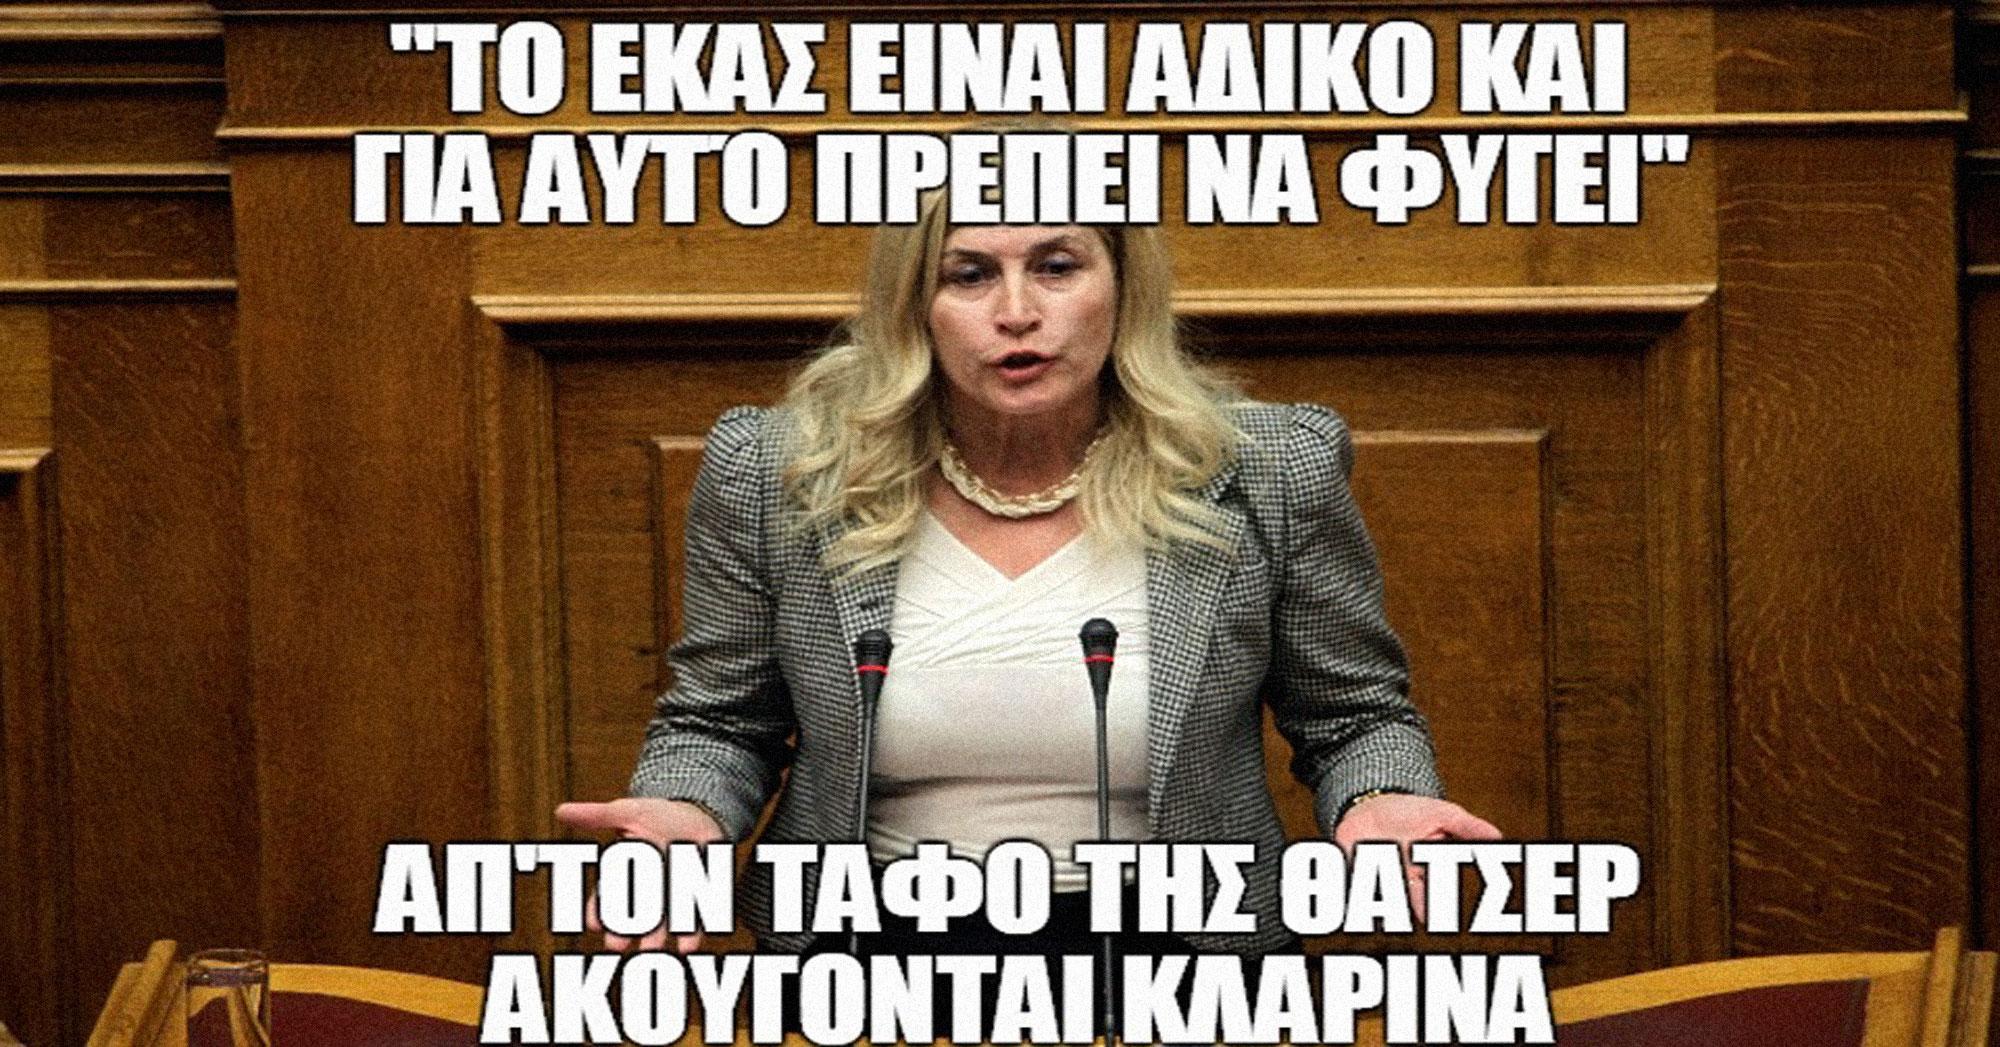 ekas-meme-A-1